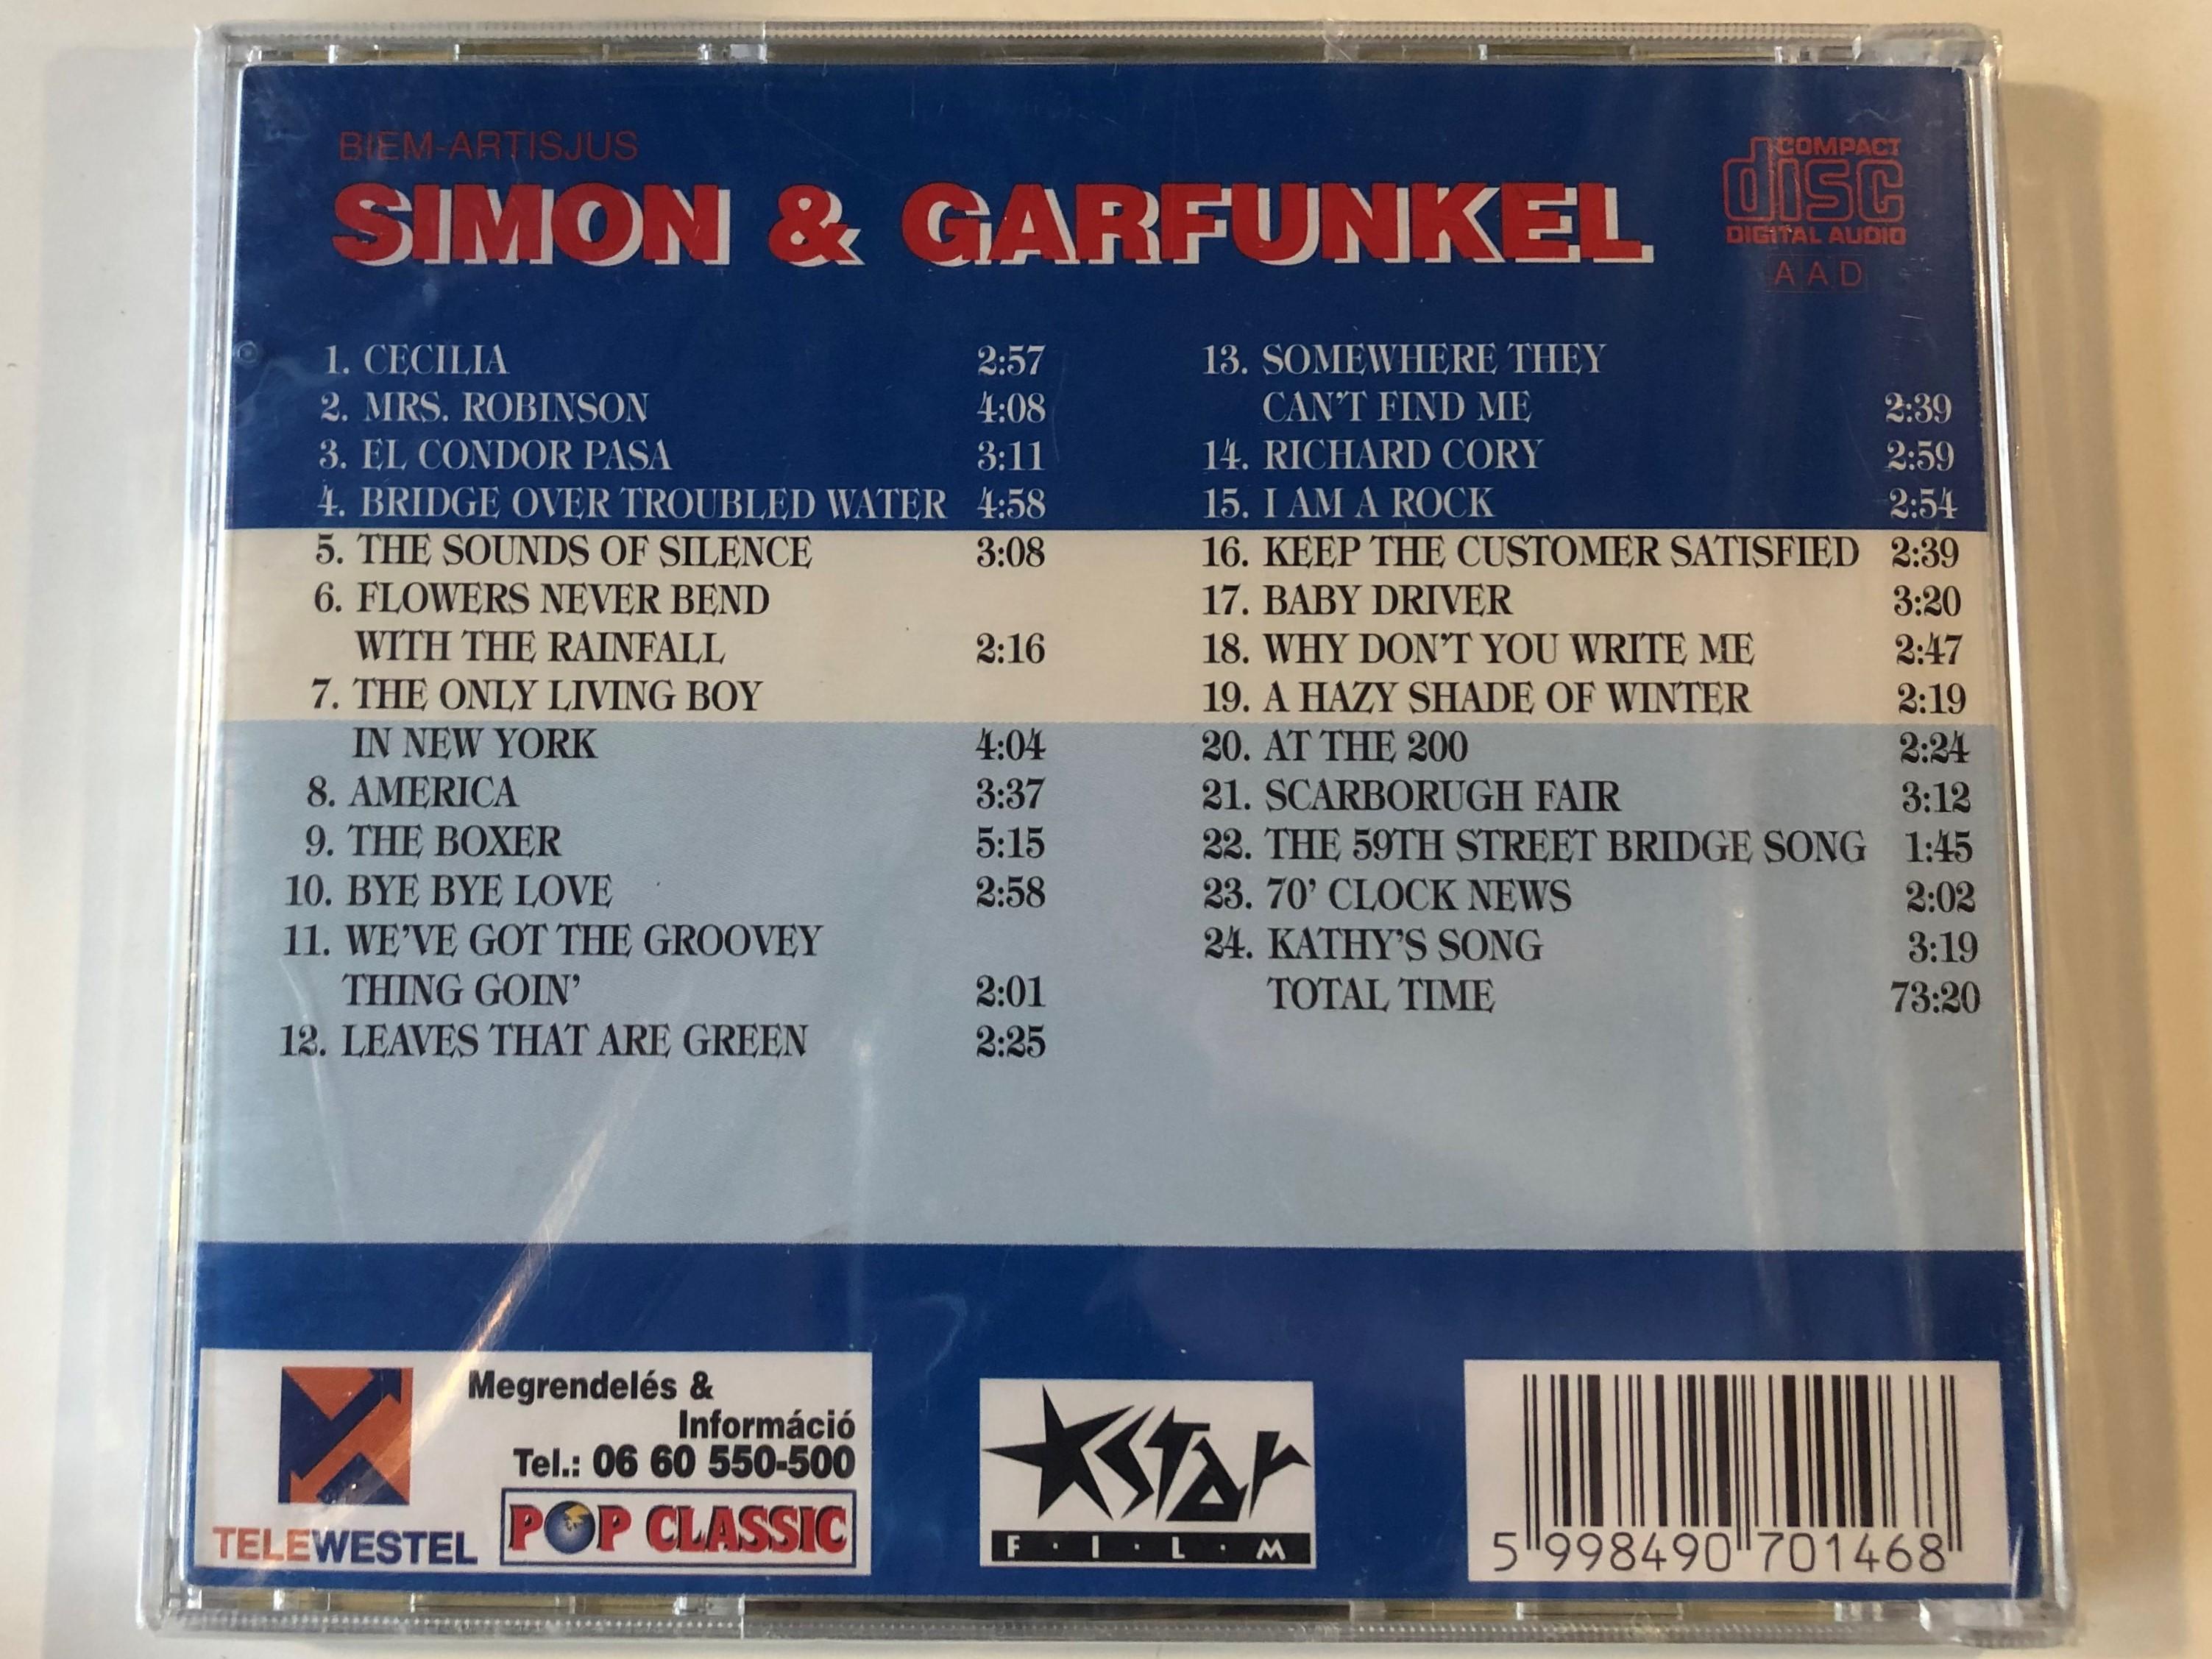 simon-garfunkel-best-of-cecilia-bye-bye-love-mrs.-robinson-el-condor-pasa-the-sounds-of-silence-bridge-over-troubled-water-pop-classic-audio-cd-5998490701468-2-.jpg